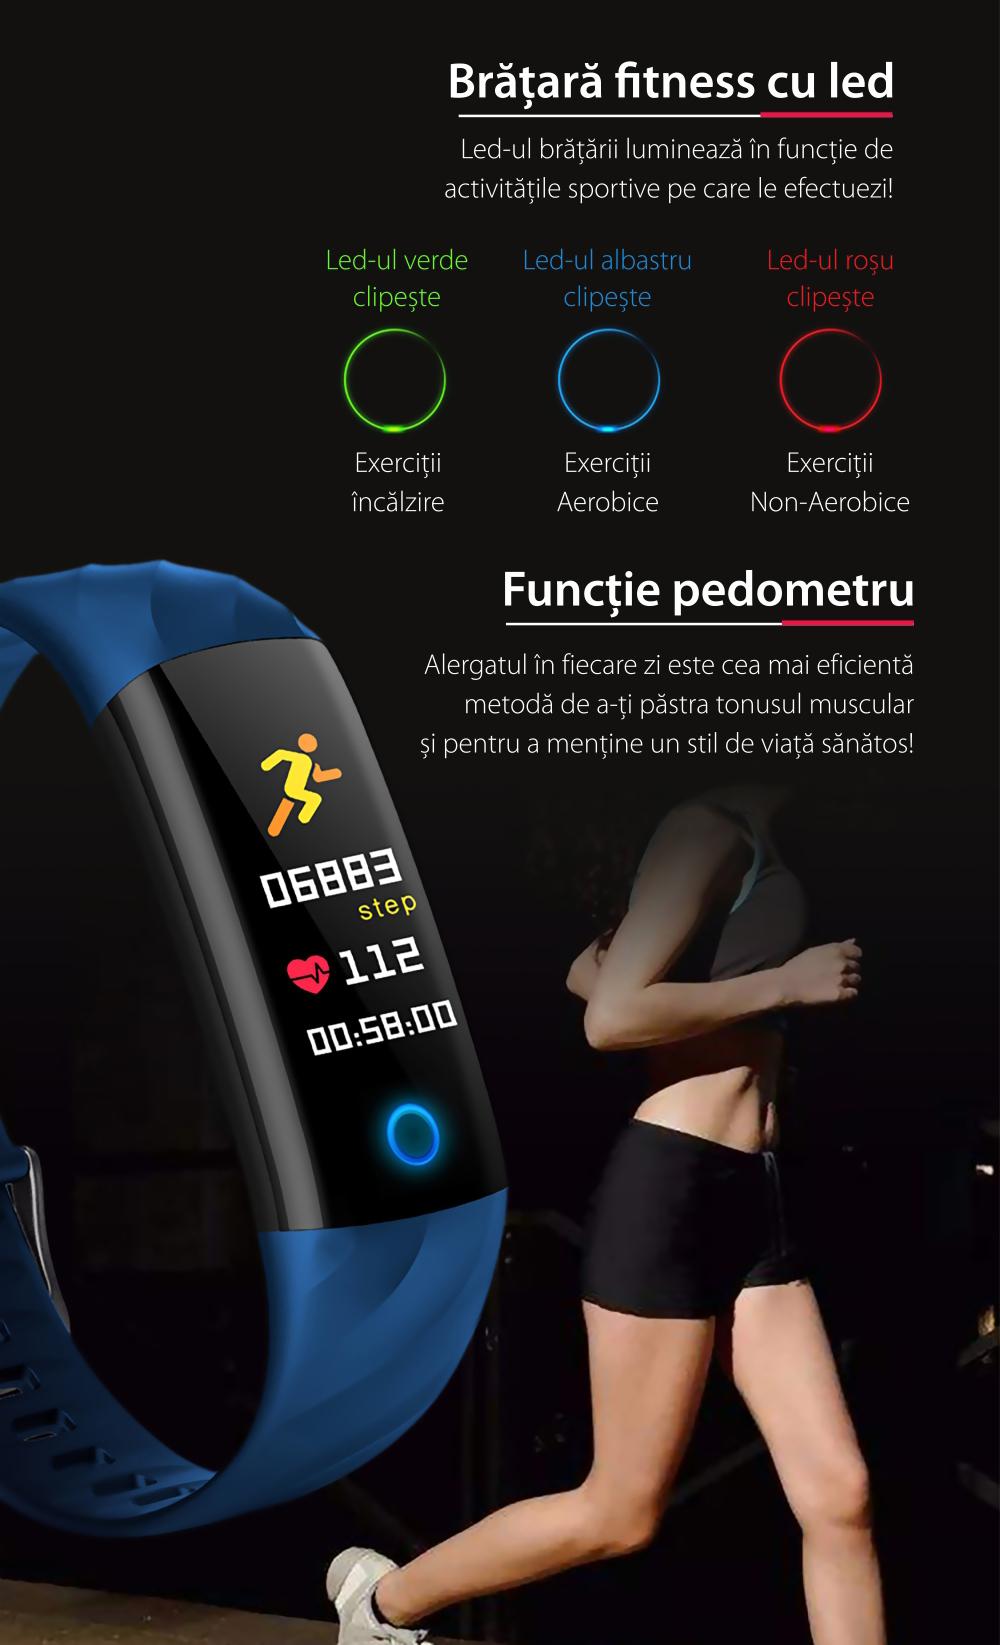 Bratara fitness inteligenta TKY-S5 cu functie de monitorizare ritm cardiac, Tensiune arteriala, Monitorizare somn, Pedometru, Notificari, Iluminare LED, Neagra